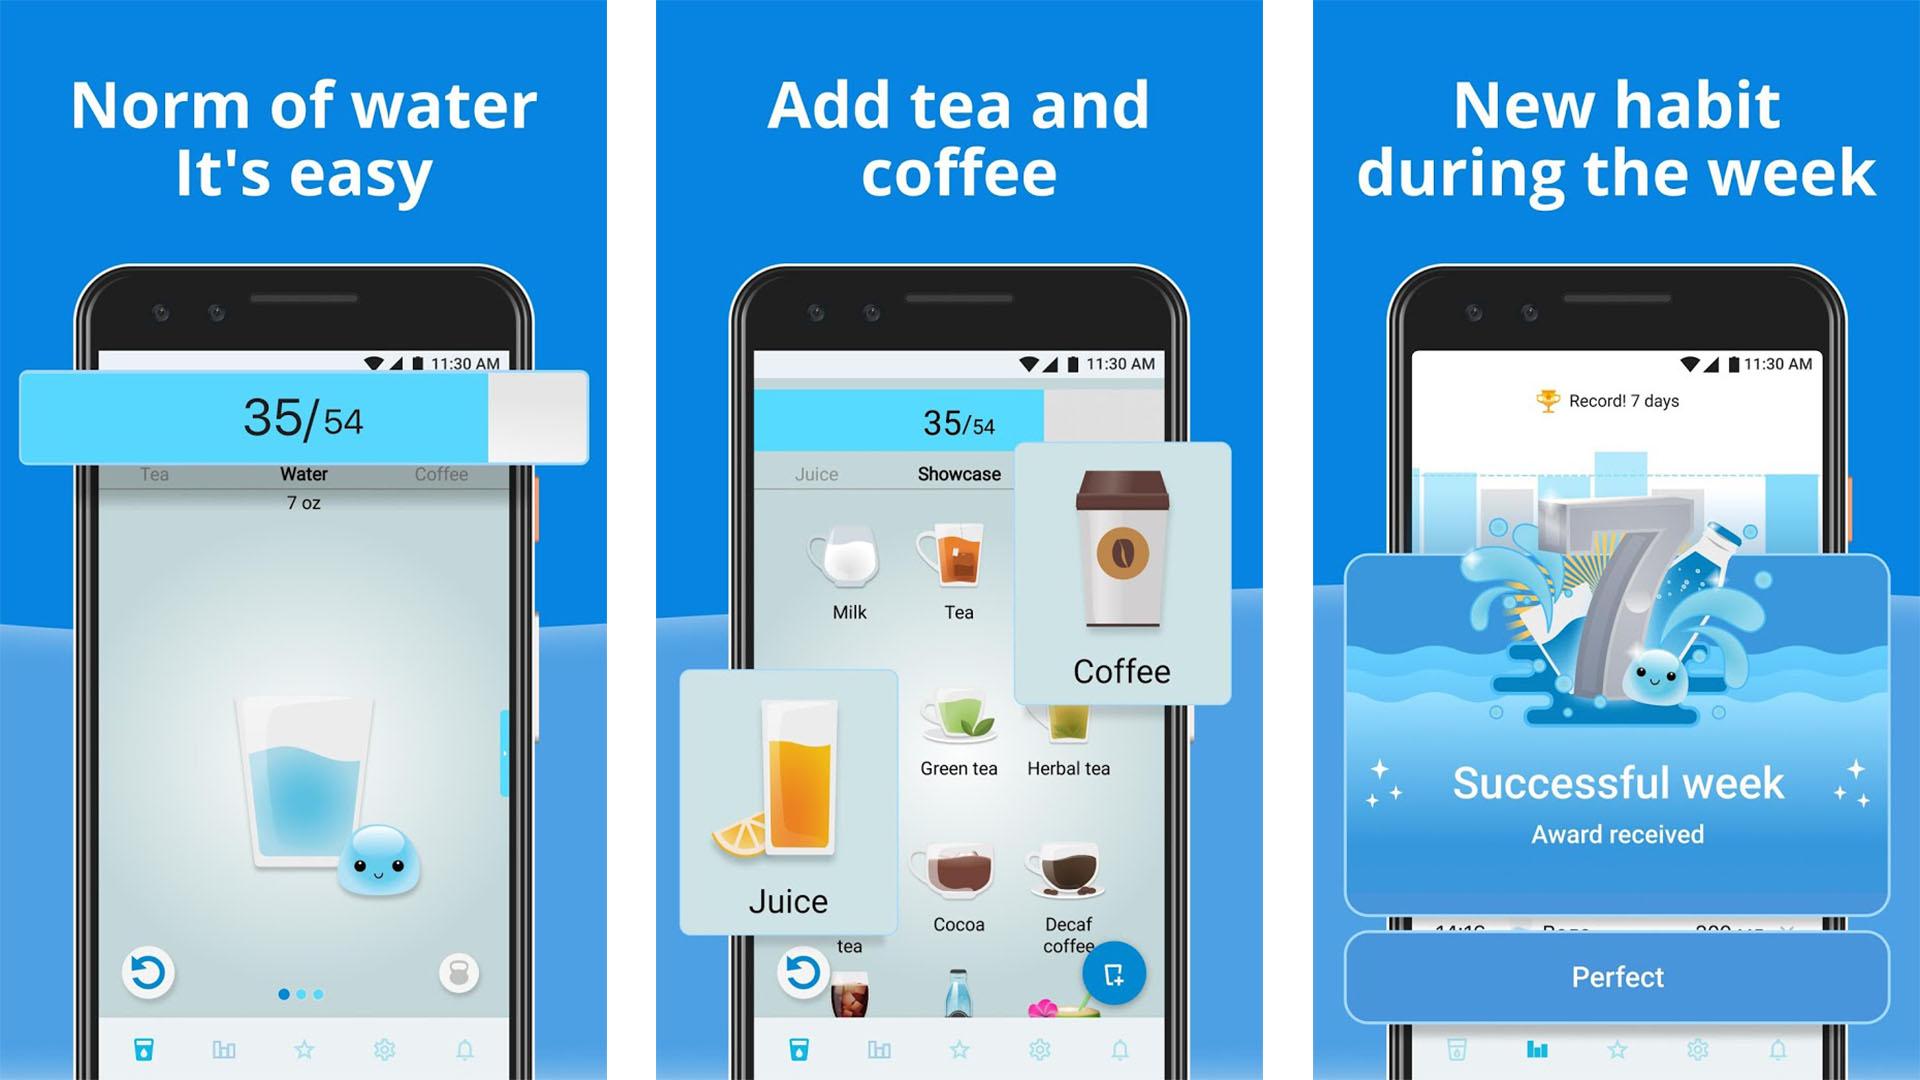 Water Time screenshot 2020